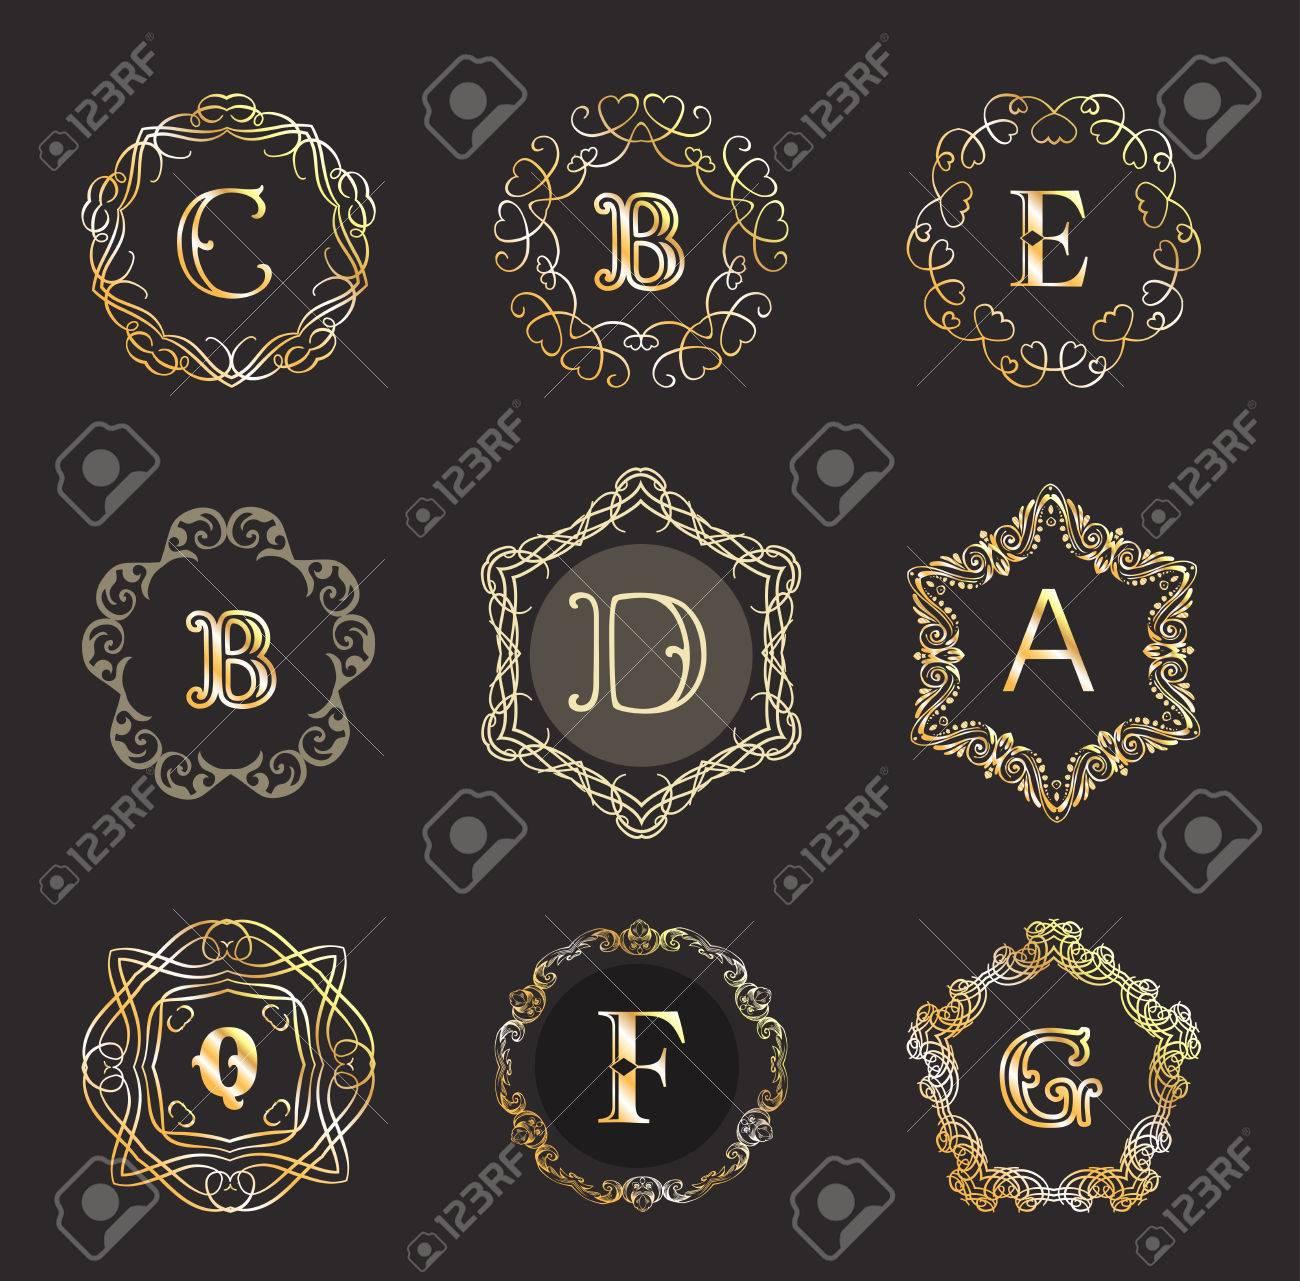 Monogram Template With Calligraphic Elegant Ornament. Identity ...